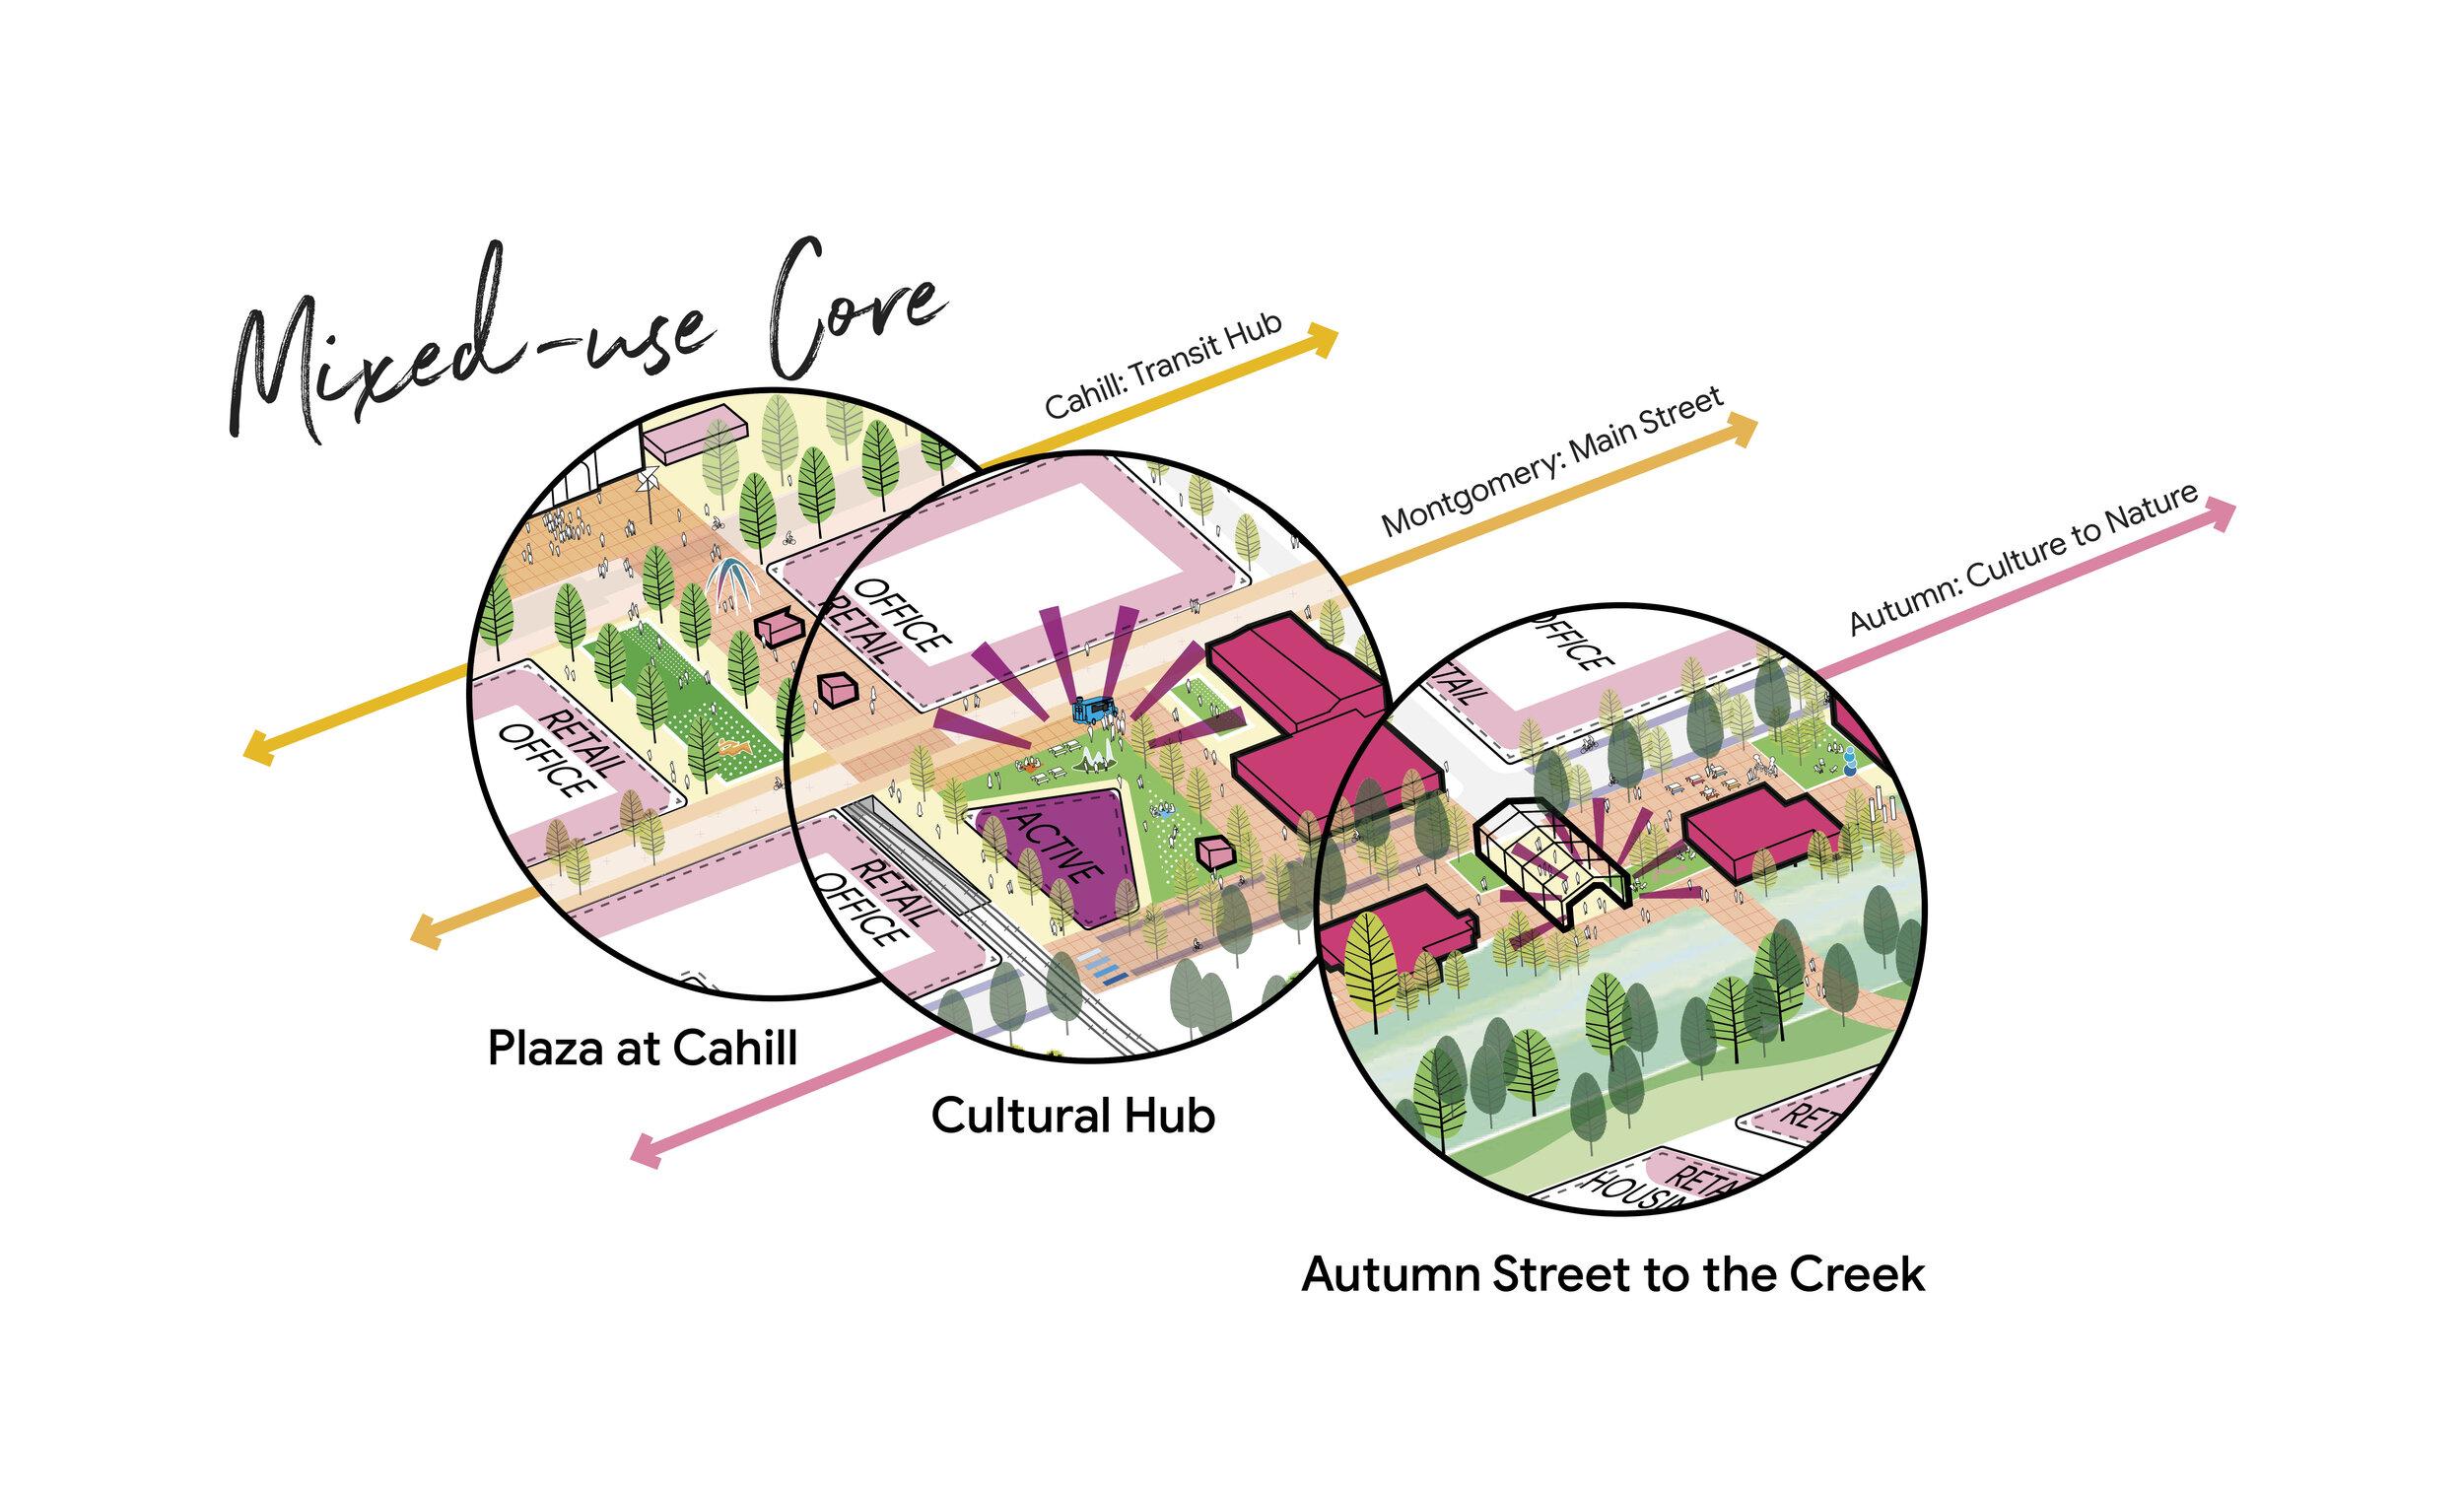 Design as Social Practice at UC berkeley - November 13, 2019SITELAB urban studio Principal, Laura Crescimano, will be speaking as part of UC Berkeley's Landscape Architecture lecture series this fall.